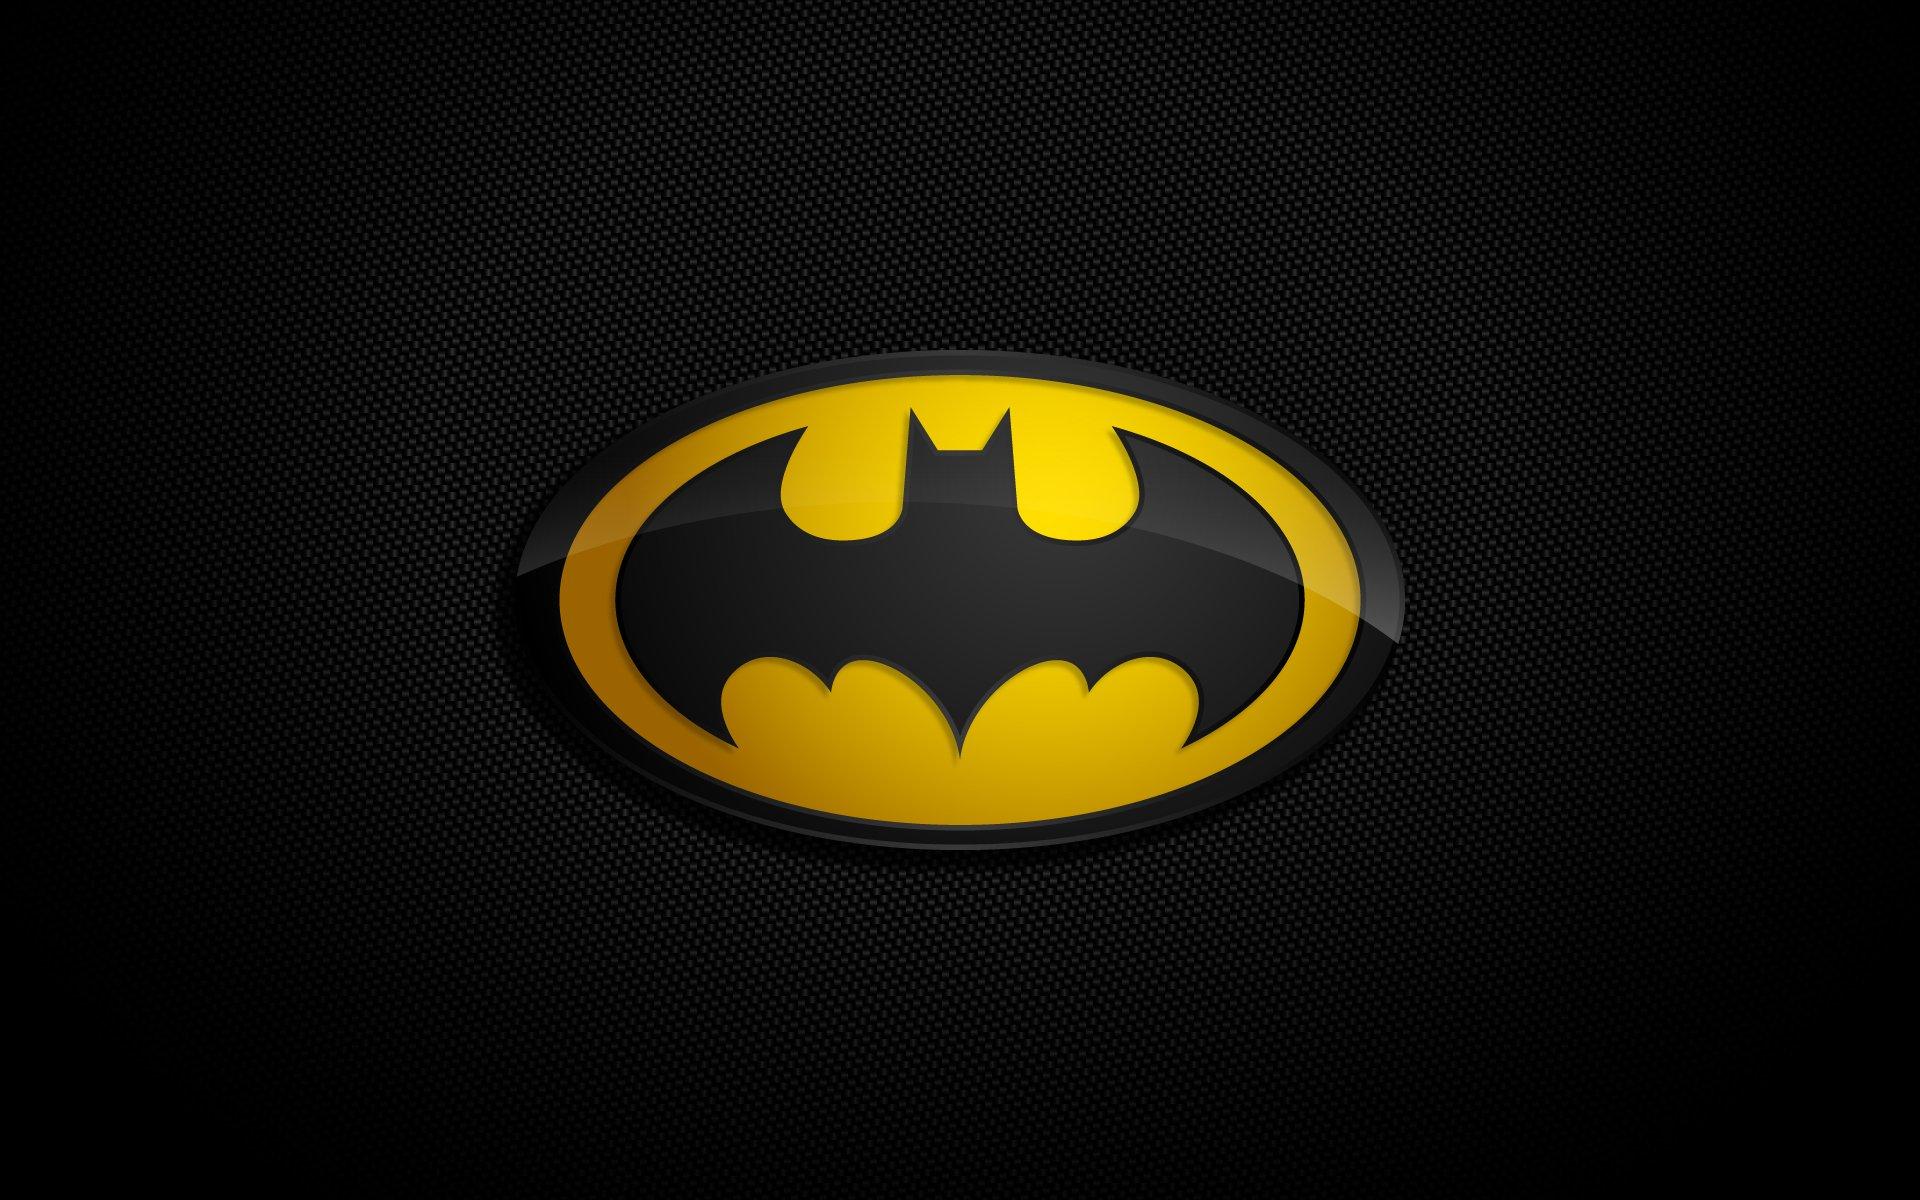 73 Batman Symbol HD Wallpapers Background Images 1920x1200